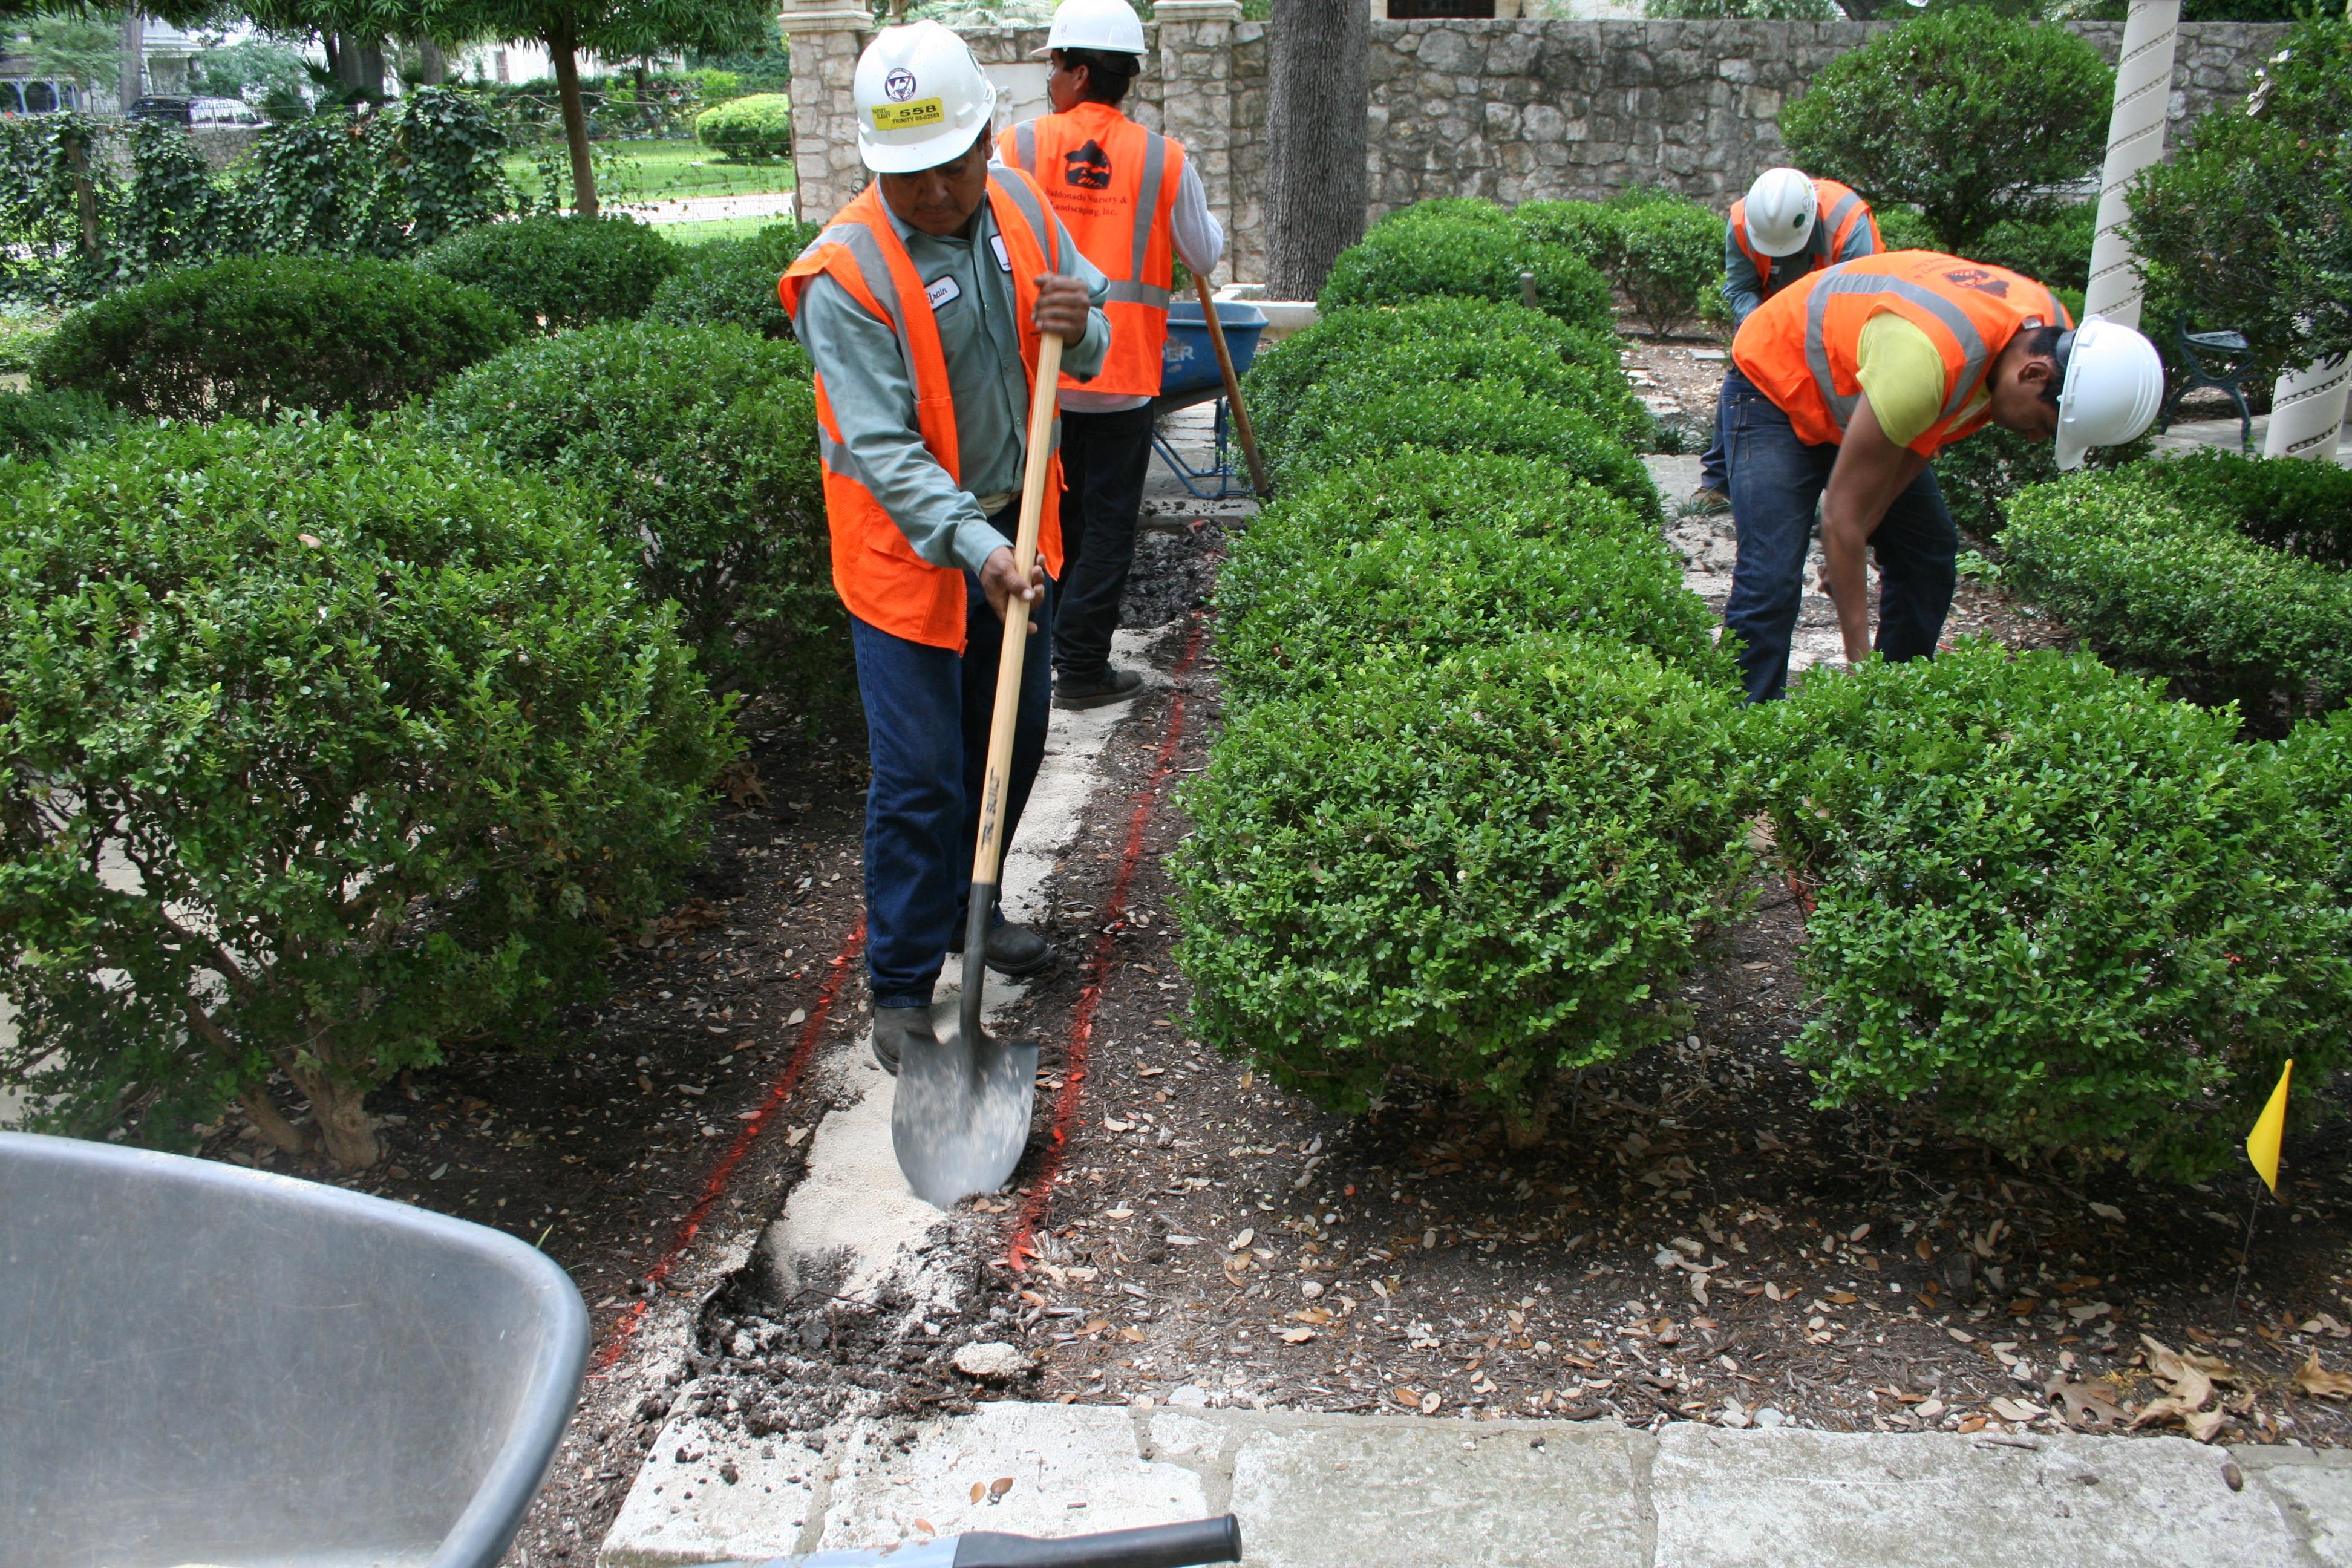 Landscape renovation pics 2012 114 for Landscape renovations